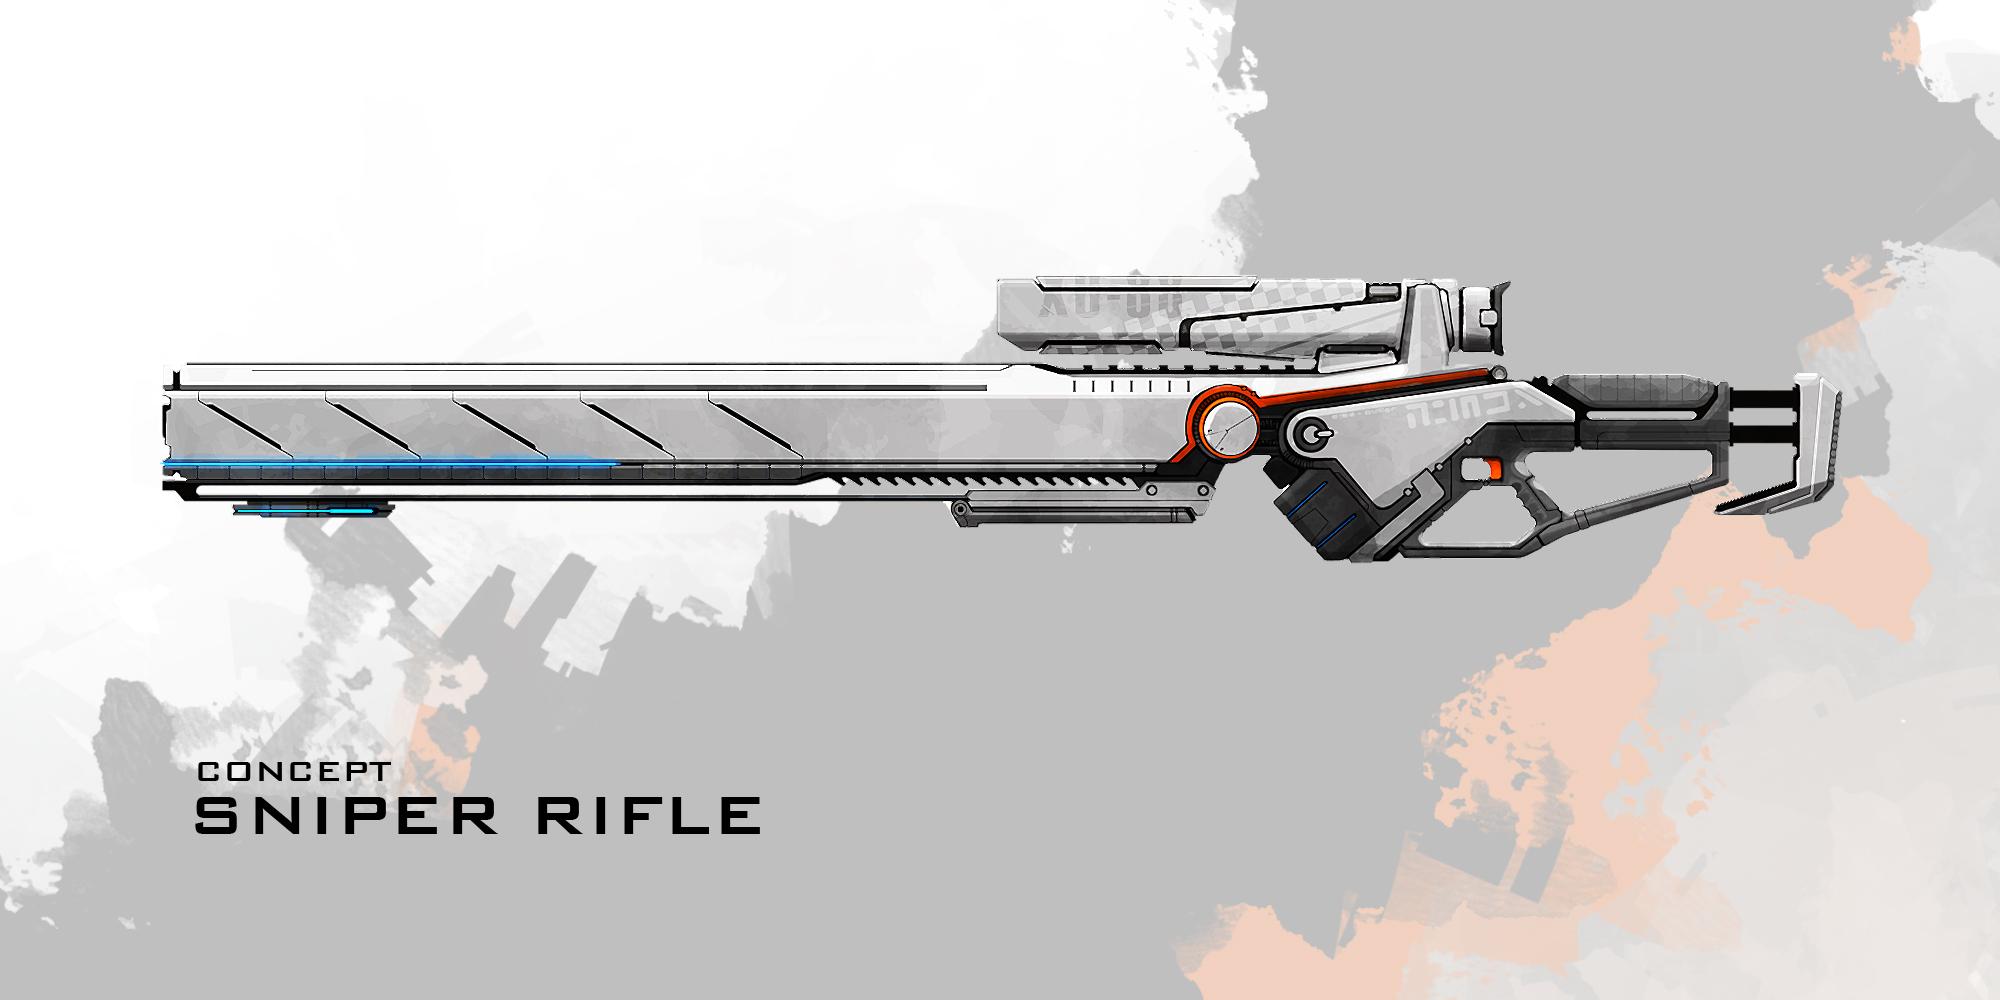 Report rss sanctum 2 weapons sniper rifle view original